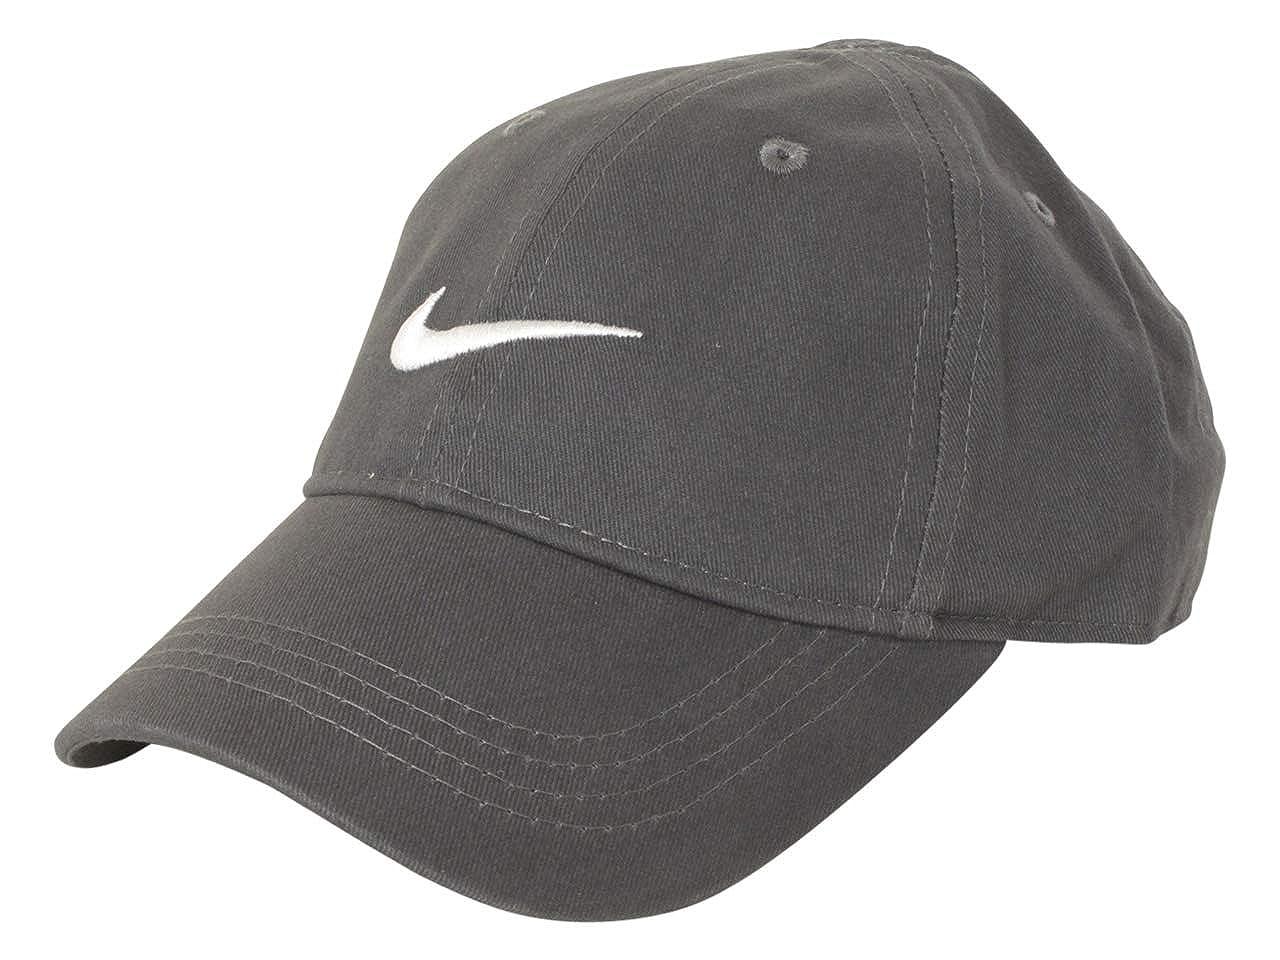 Nike Toddler Solid Swoosh Cotton Baseball Cap Sz: 2/4T